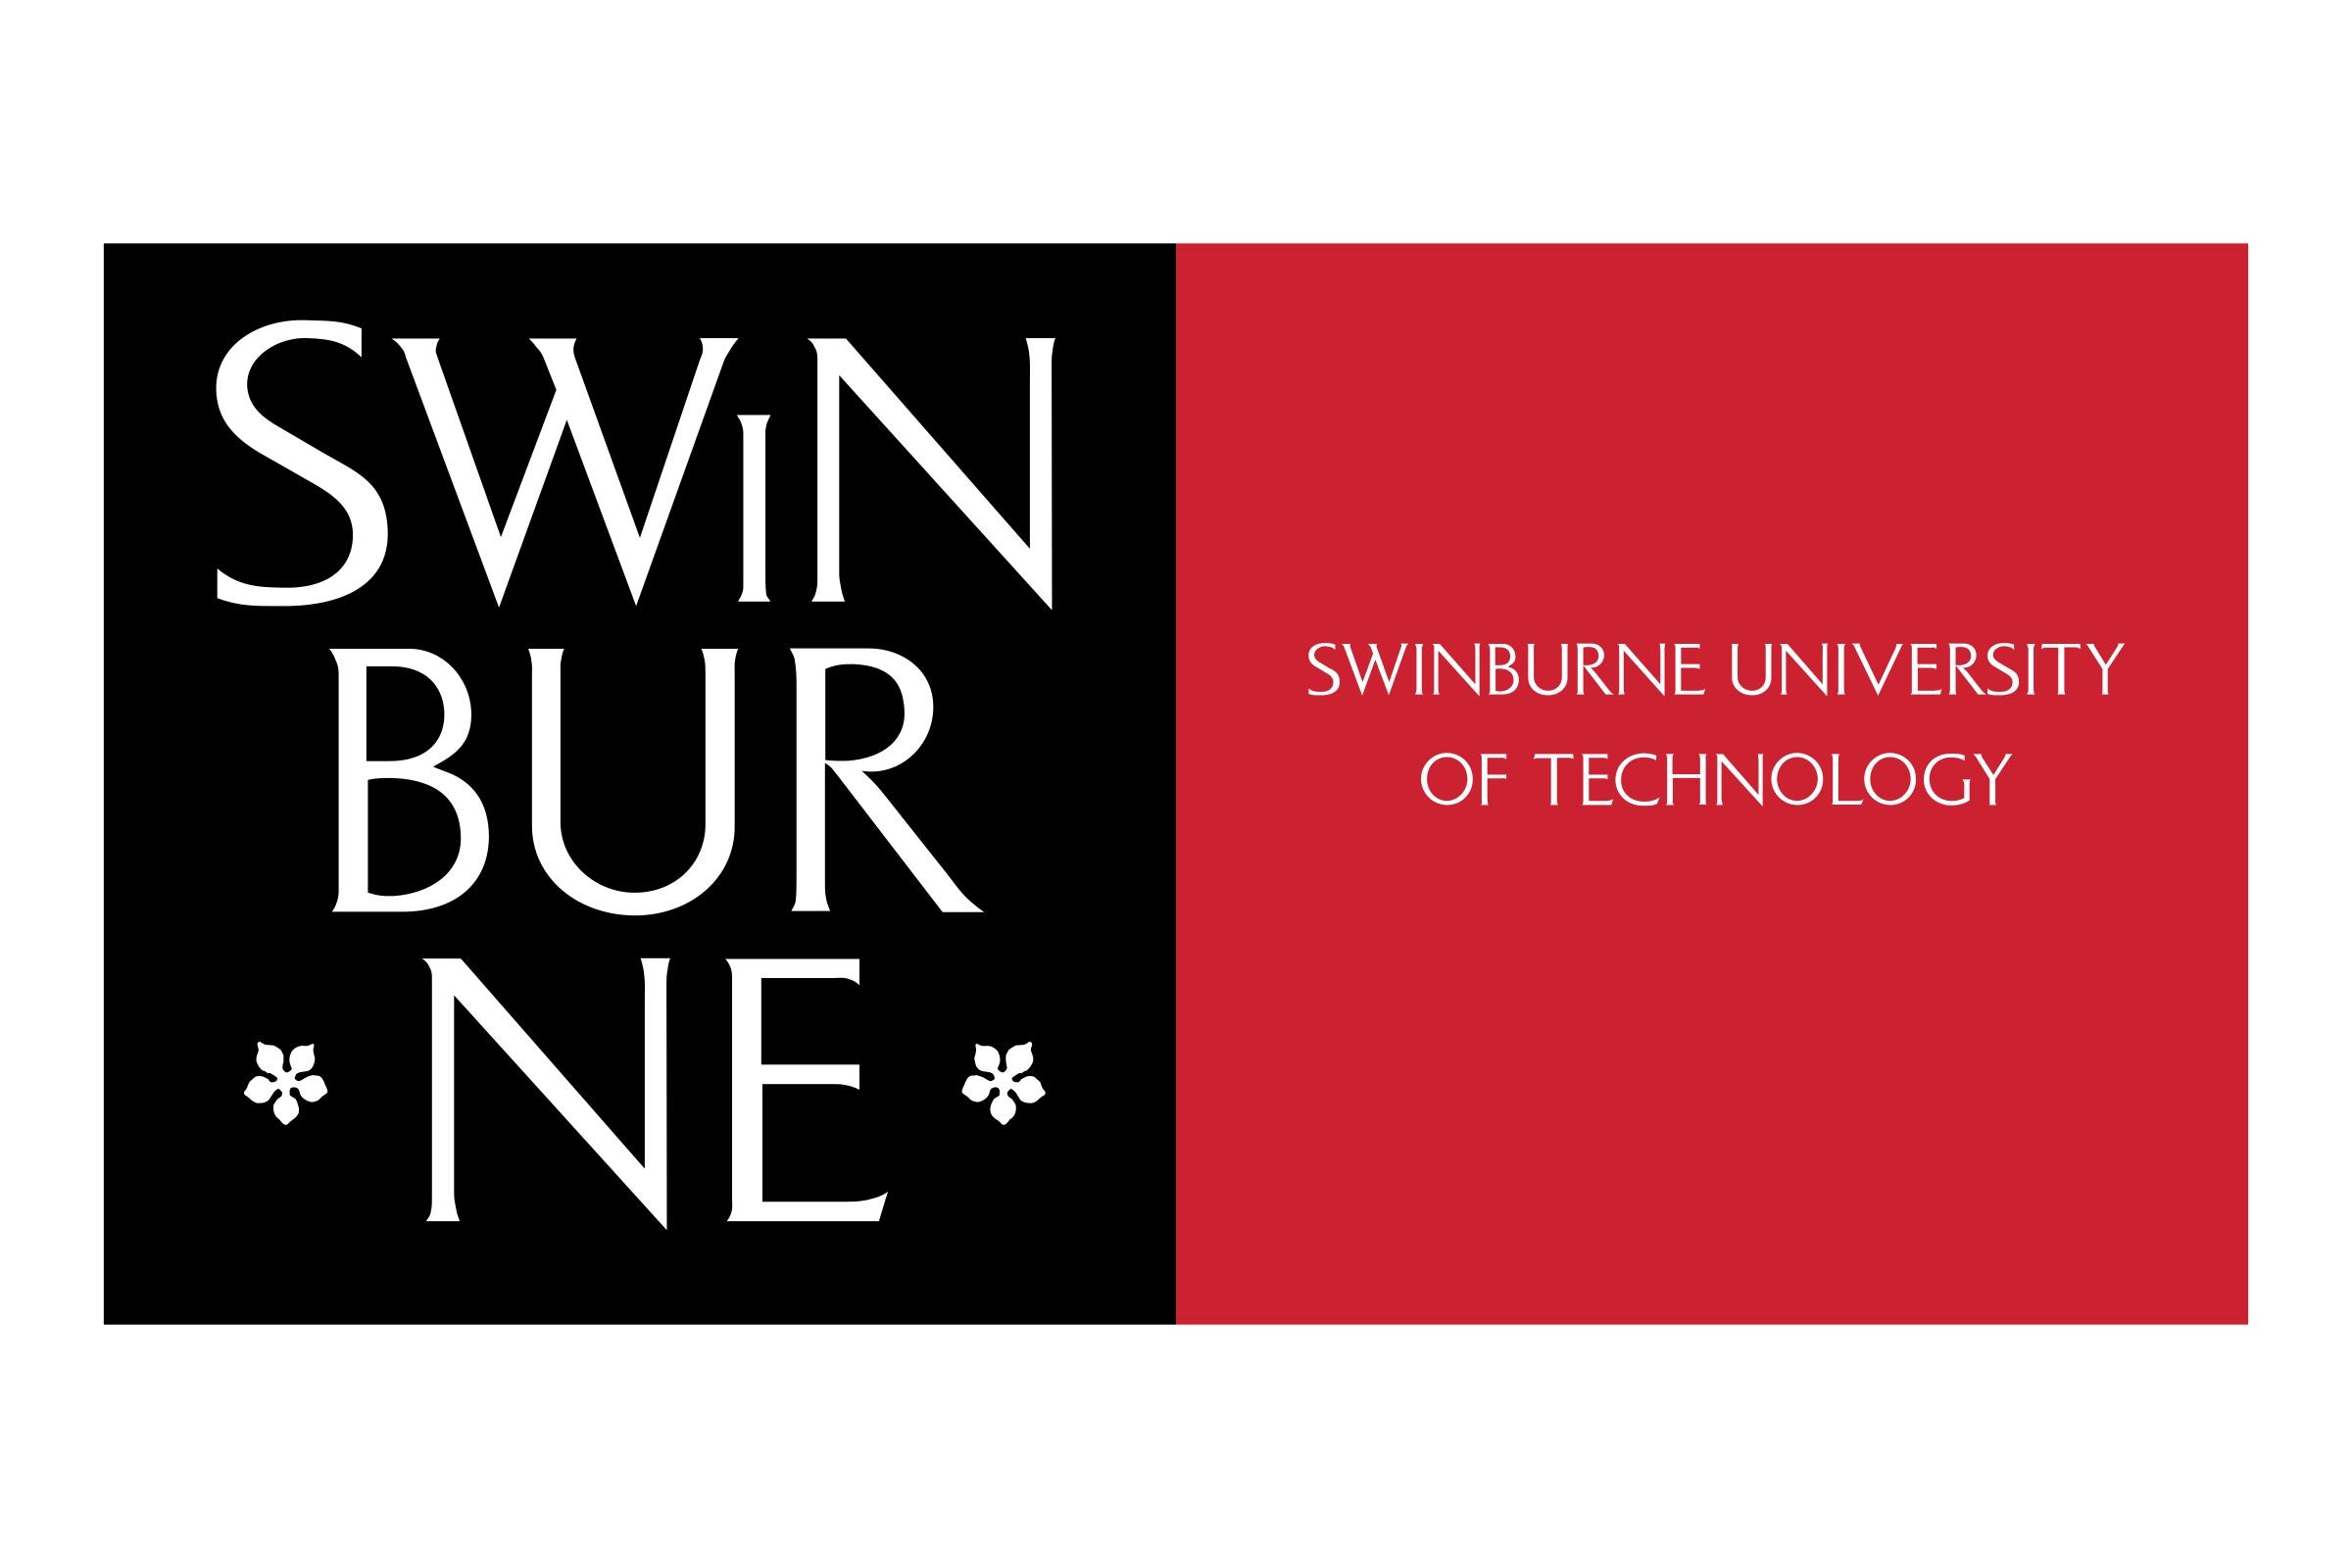 swinburne-university-of-technology-7-logo-png-transparent.jpg